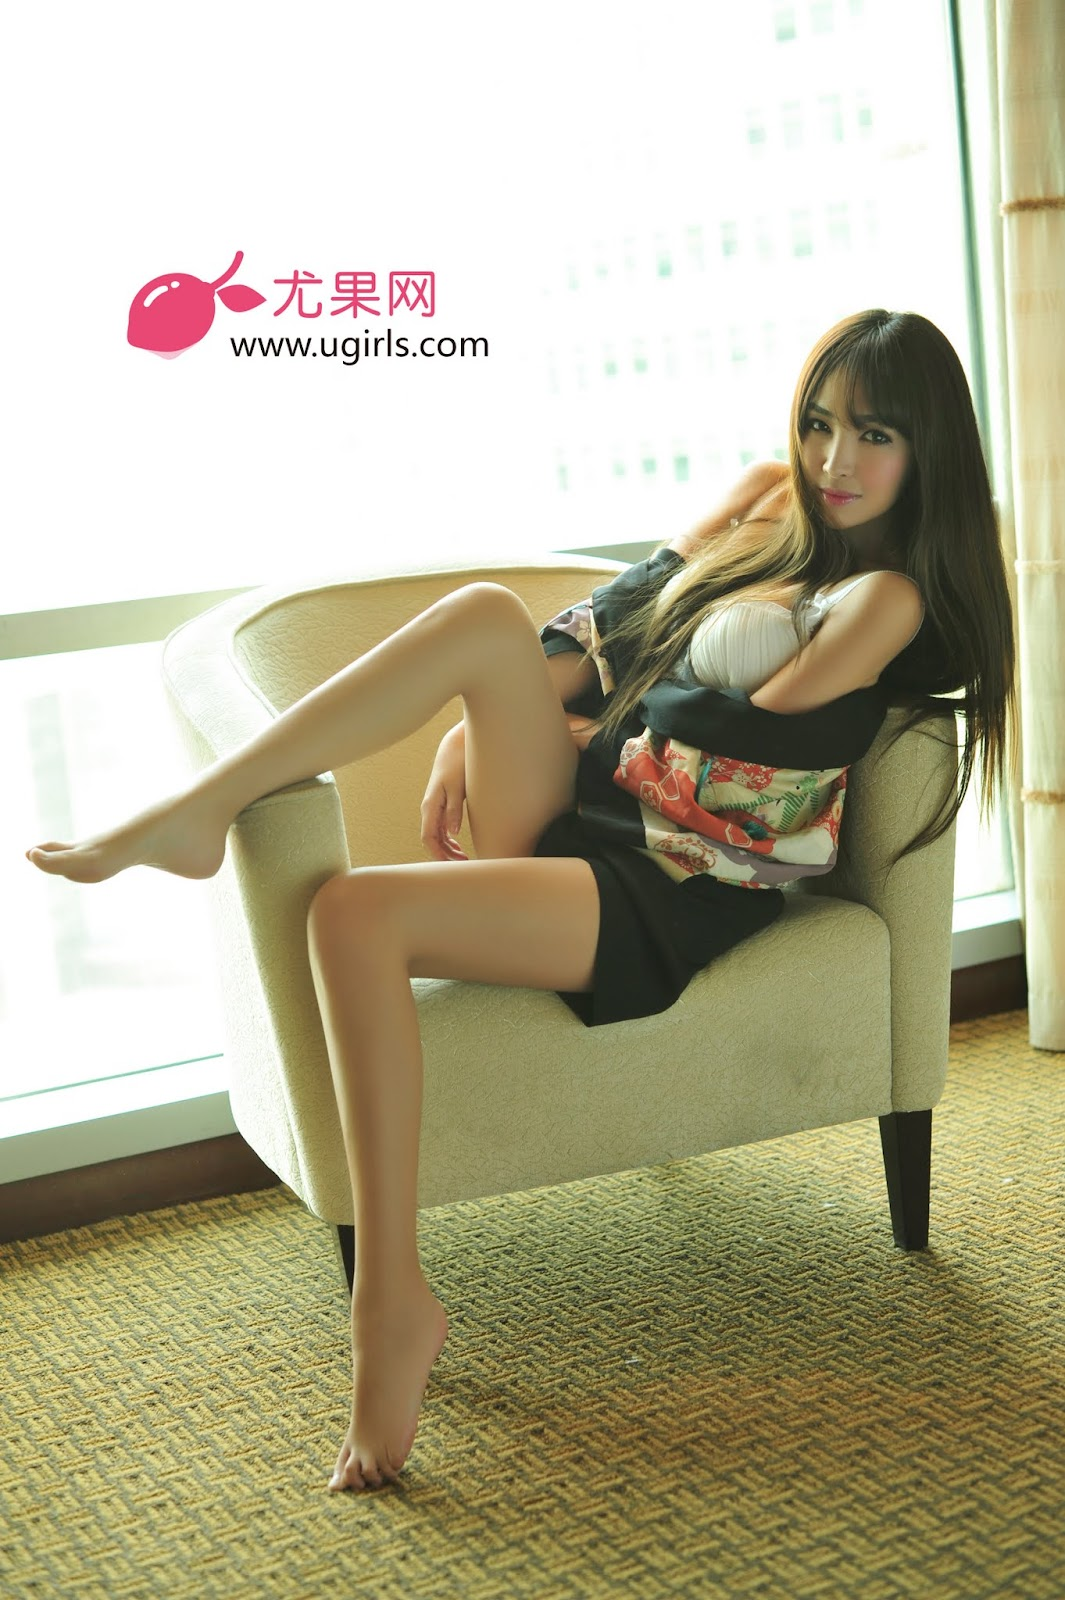 DLS 4512 - Hot Girl Model UGIRLS NO.13